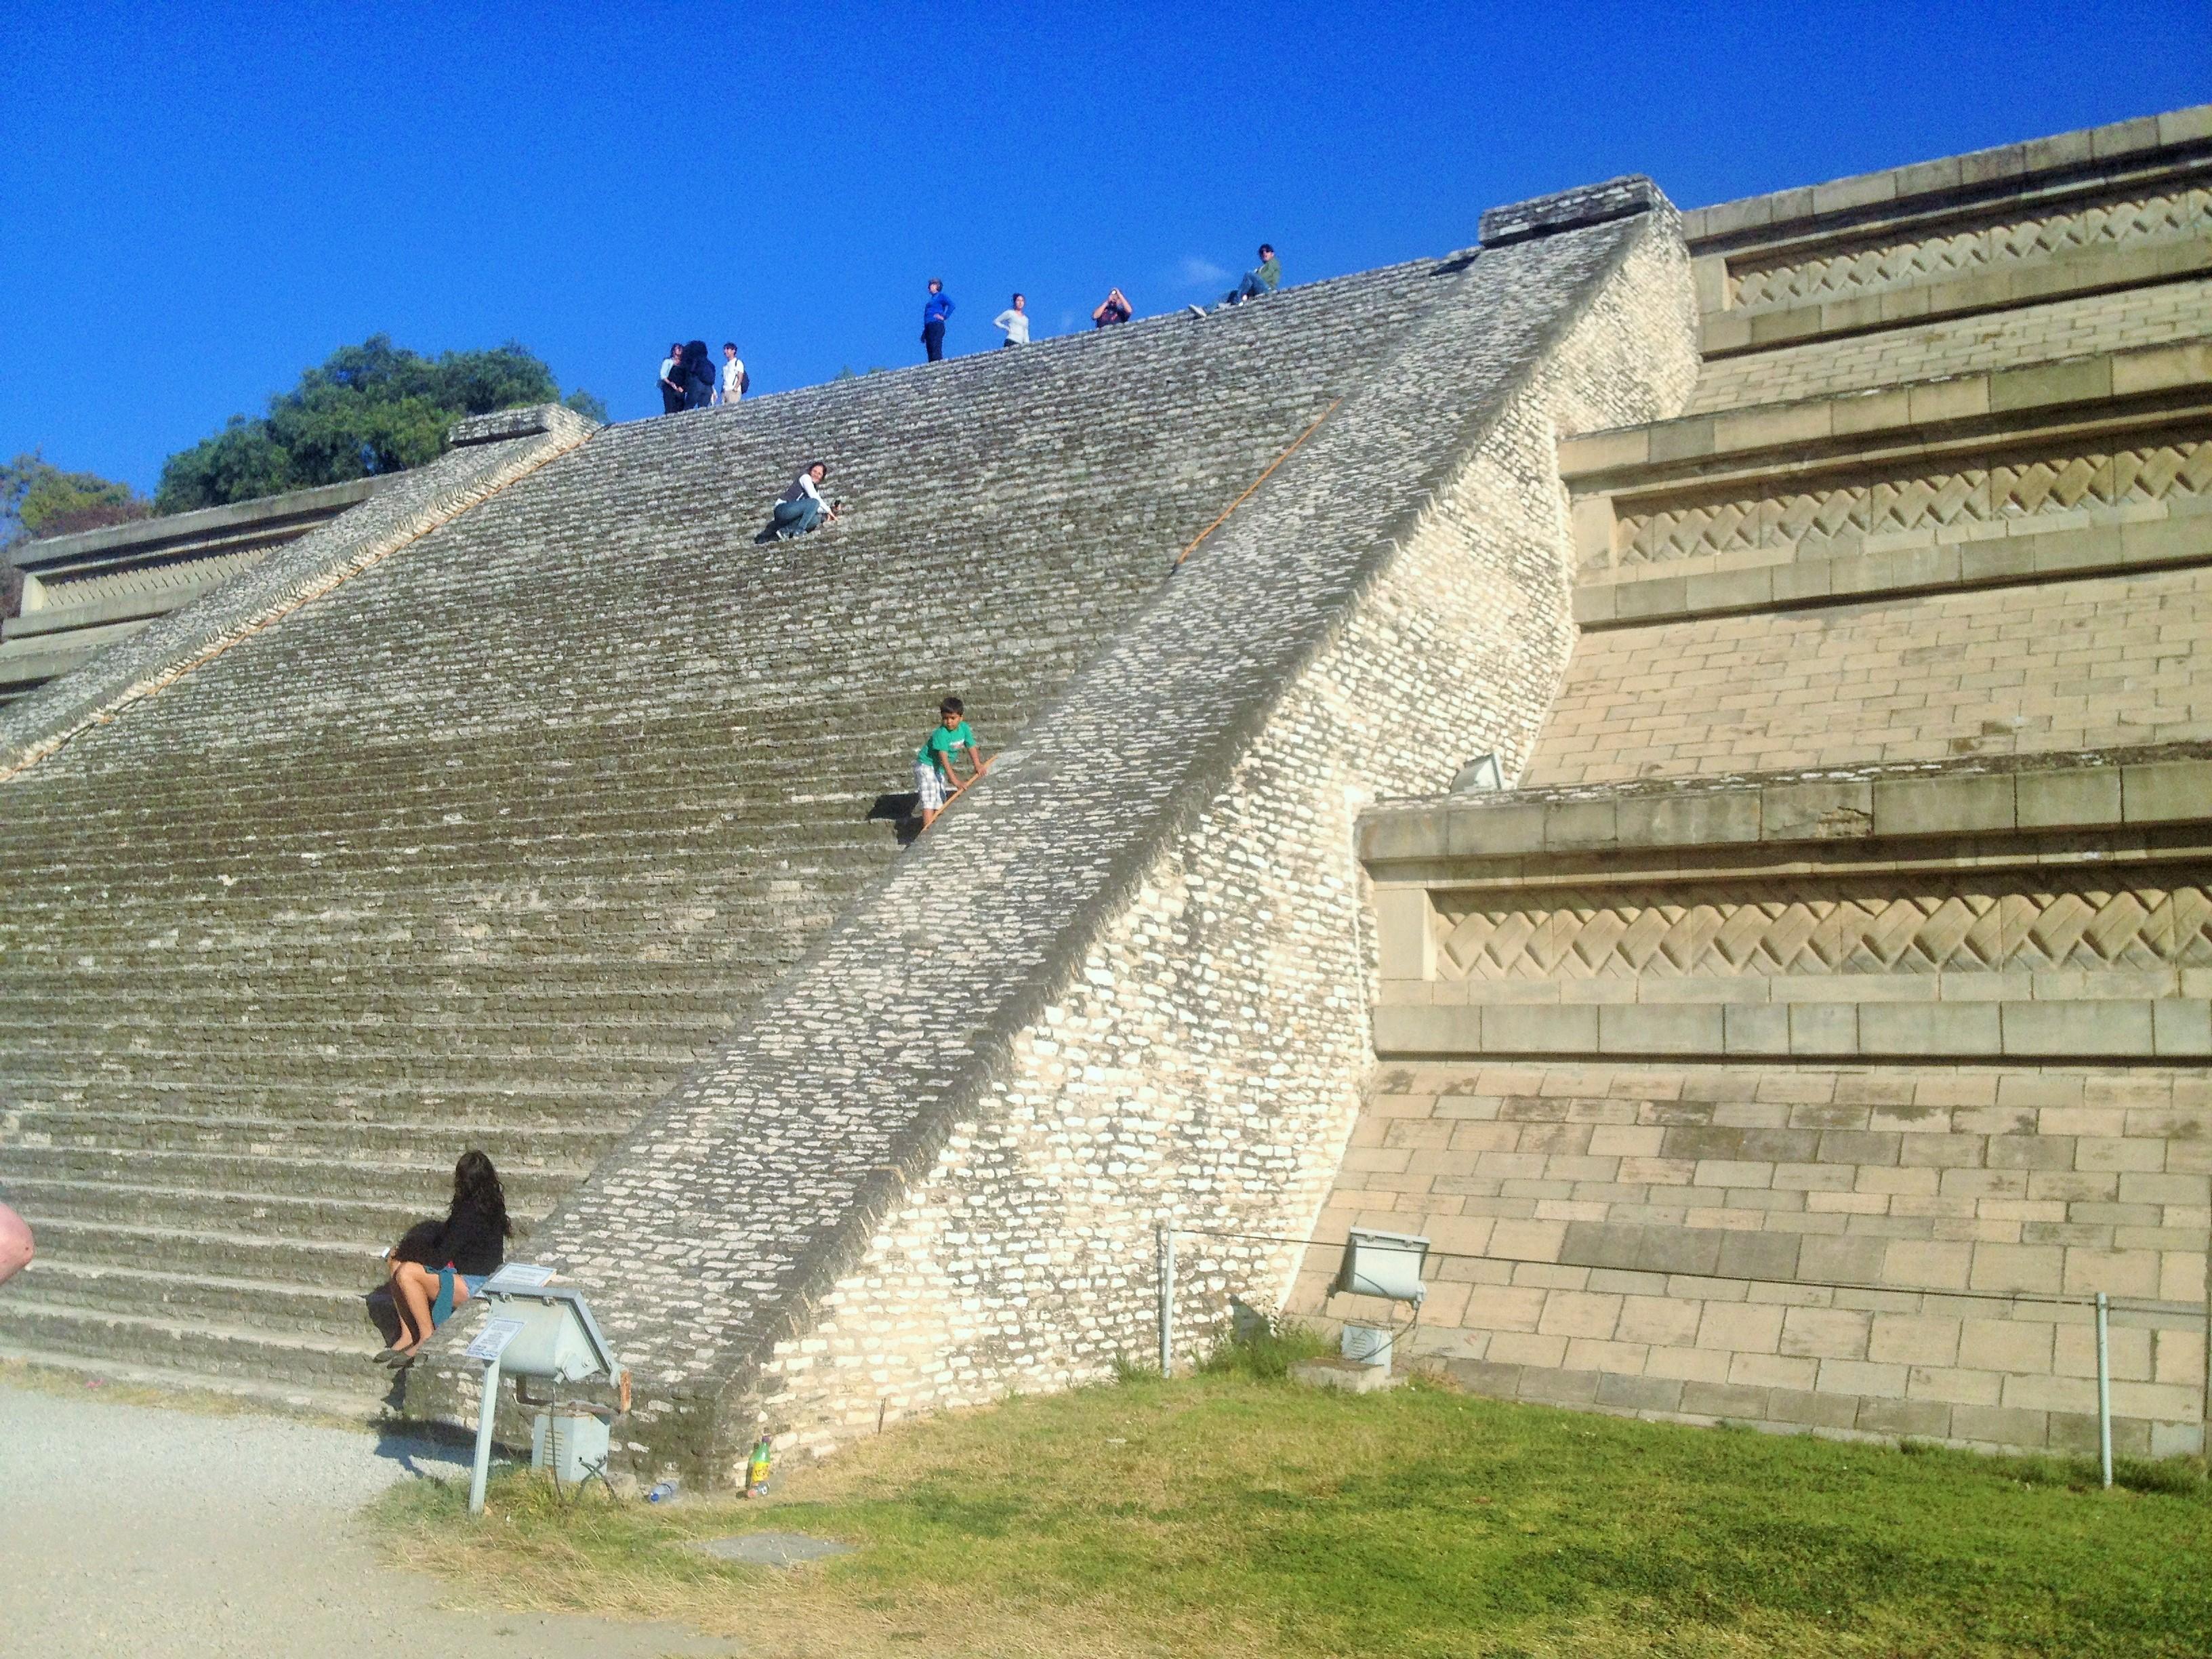 Vista das Pirâmides de Cholula - Puebla - México